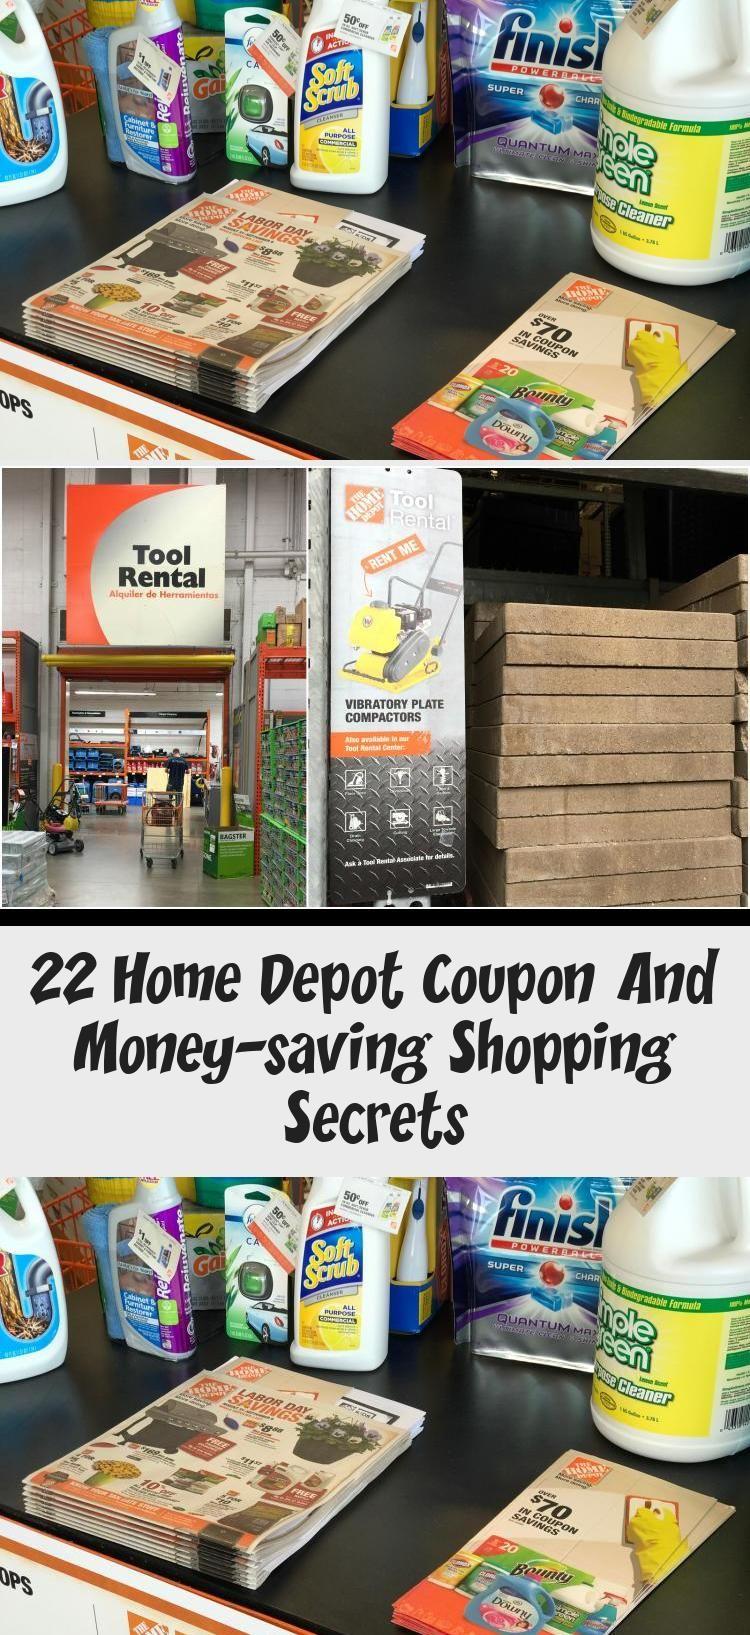 22 Home Depot Coupon And Moneysaving Shopping Secrets